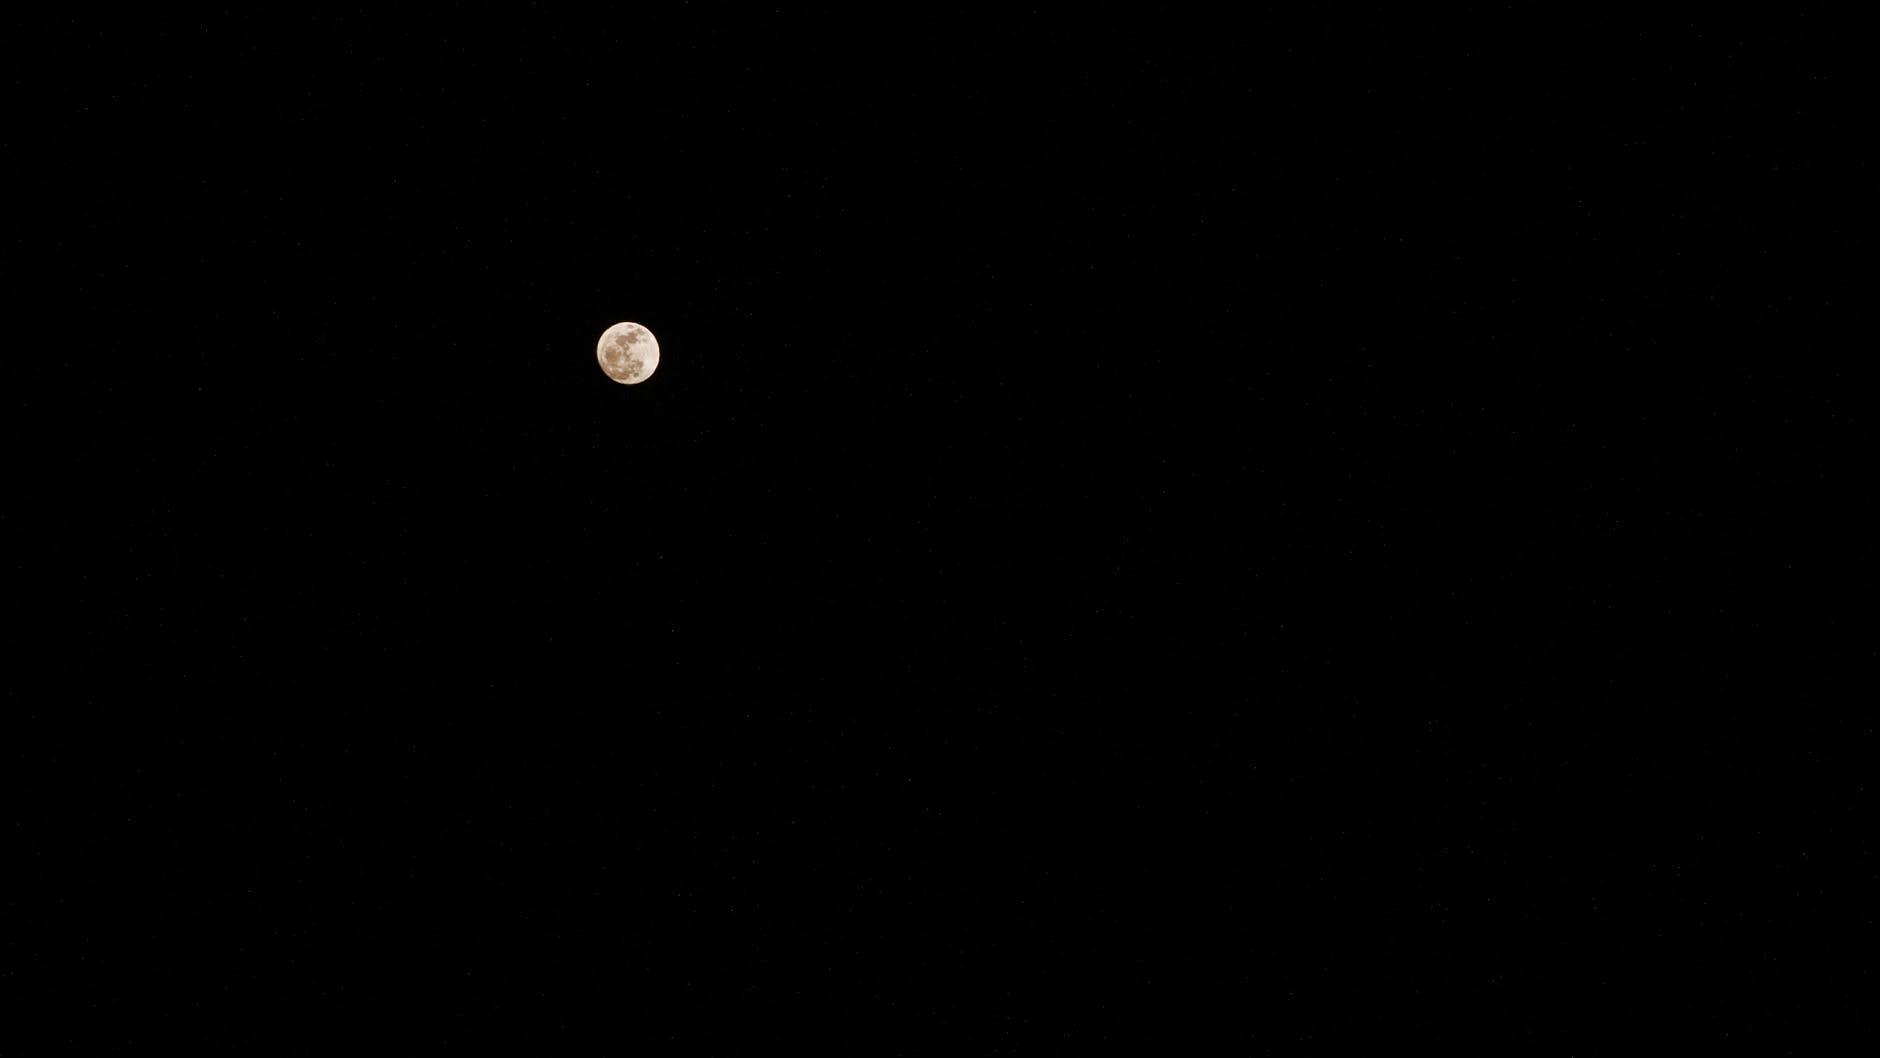 Photo of Full Moon, Photo of Full Moon